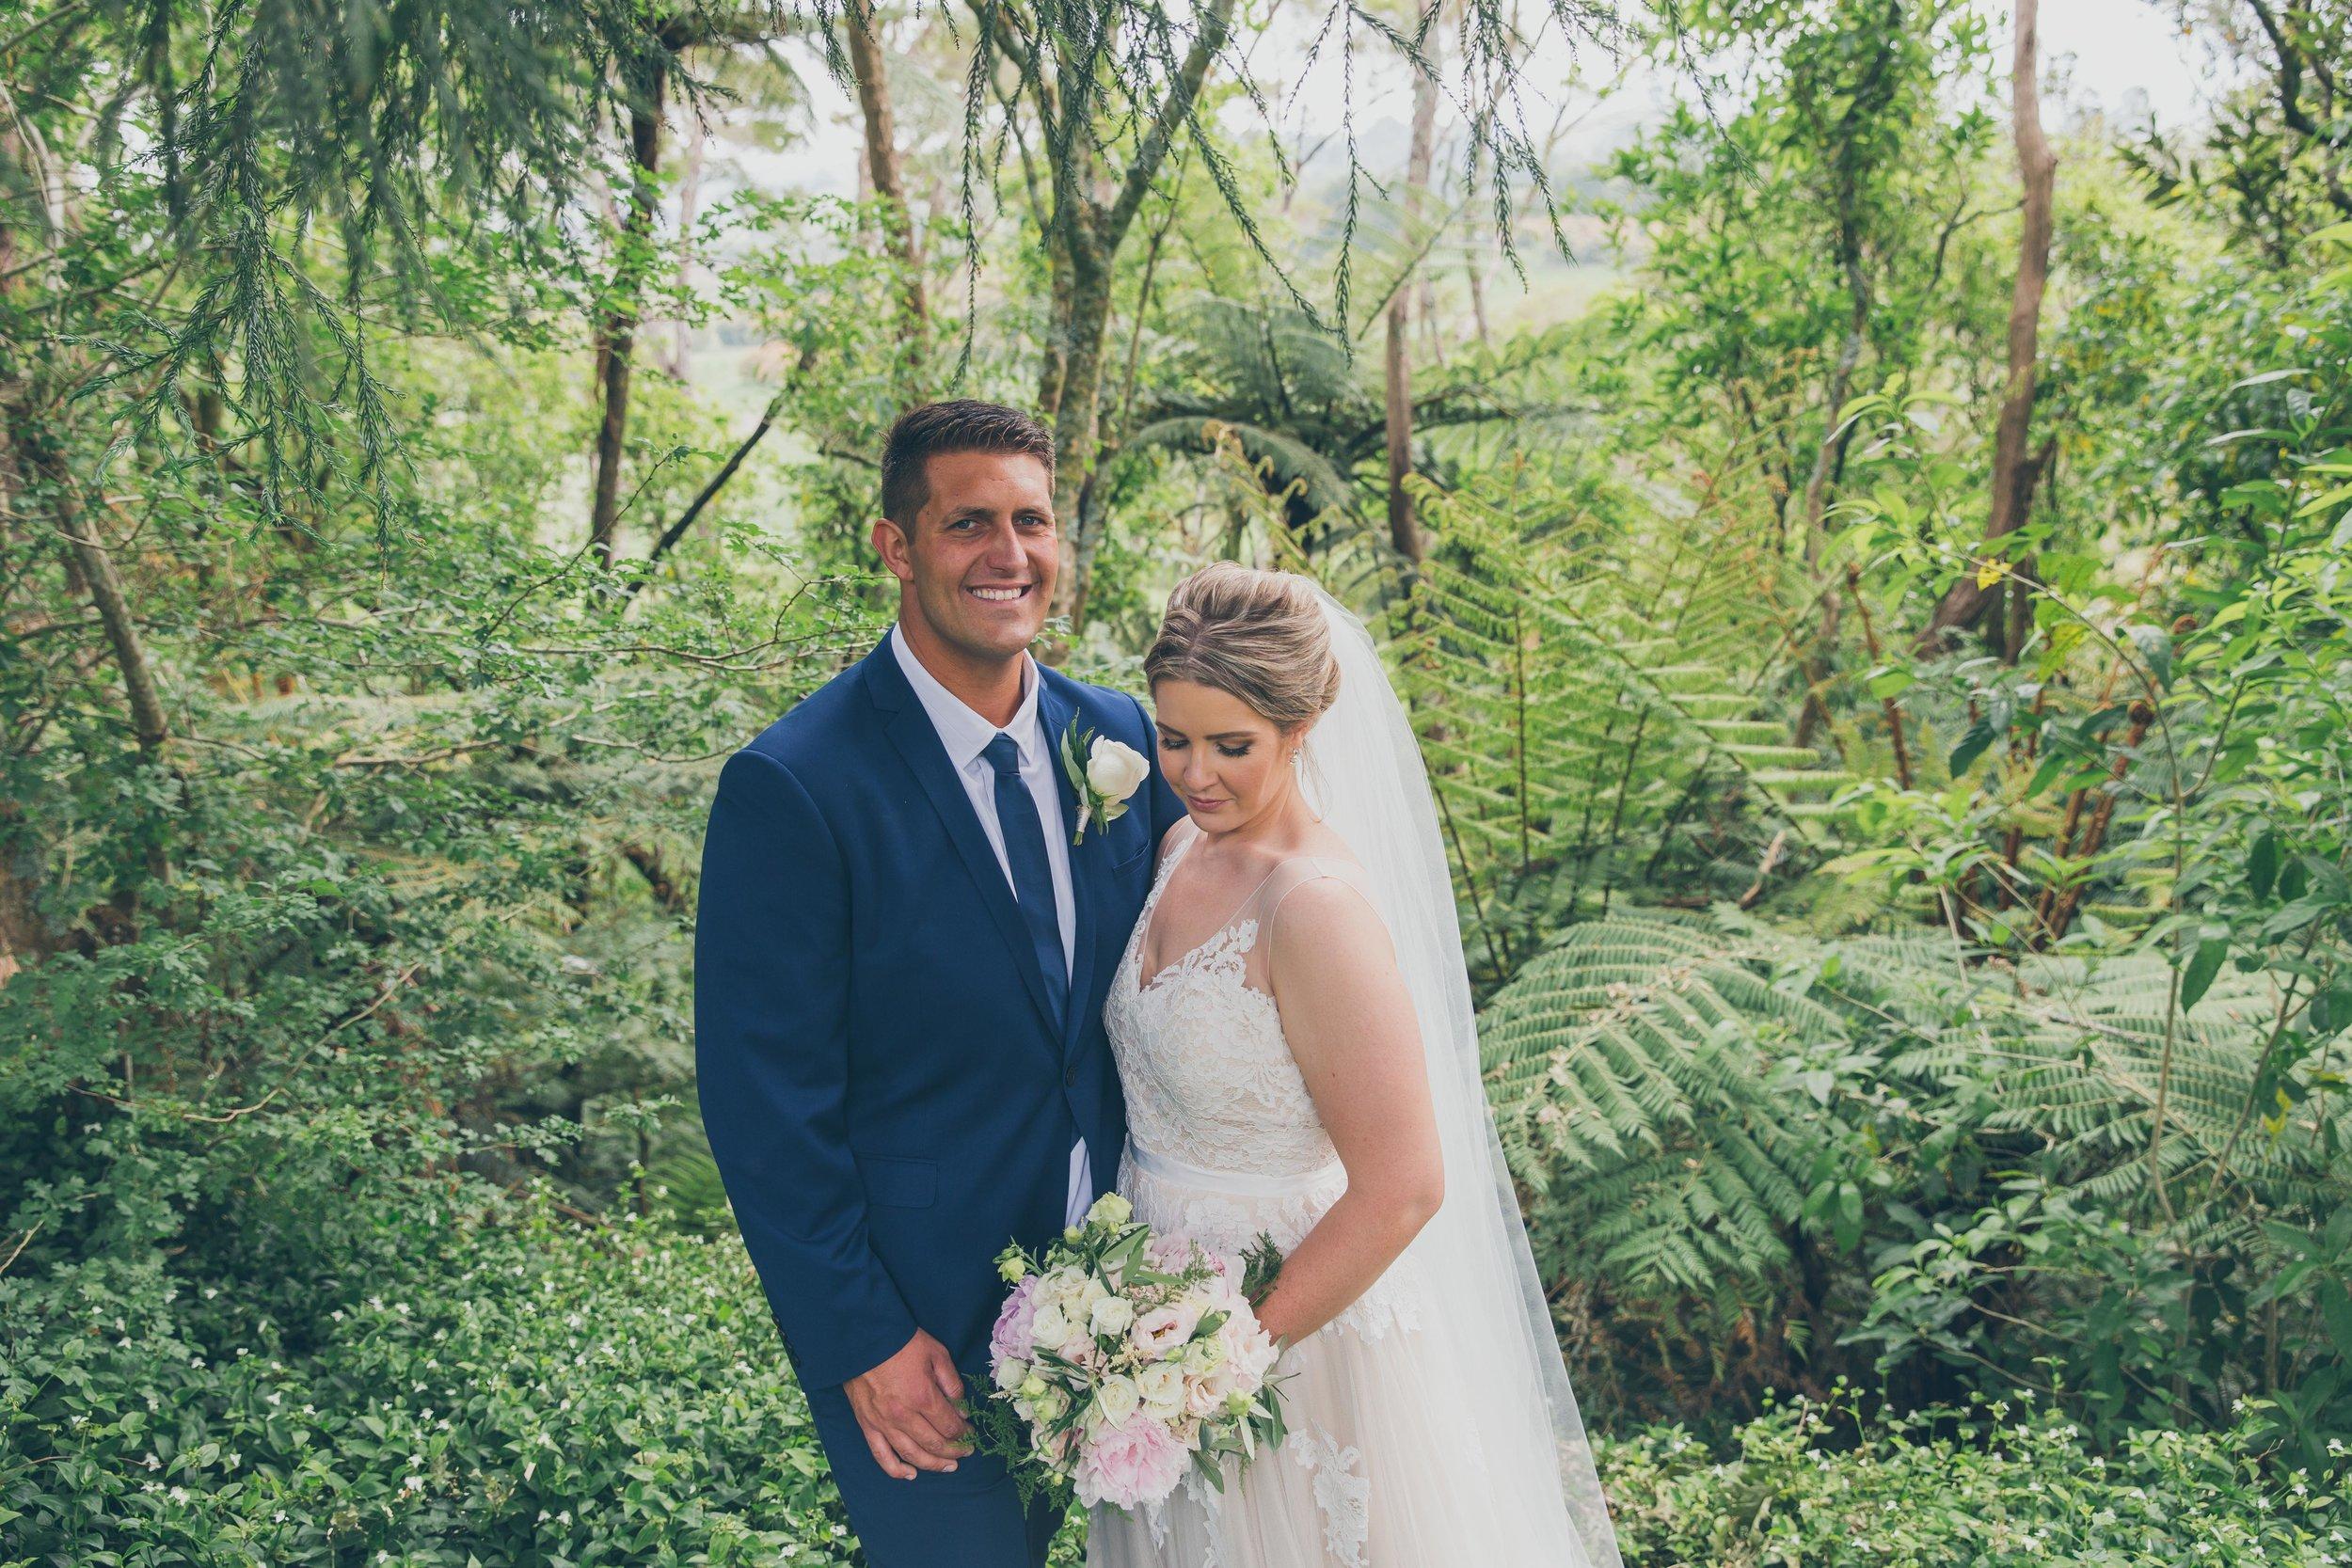 C & J - Wedding - Oh Joy! Photography - Tauranga, New Zealand-8.jpg